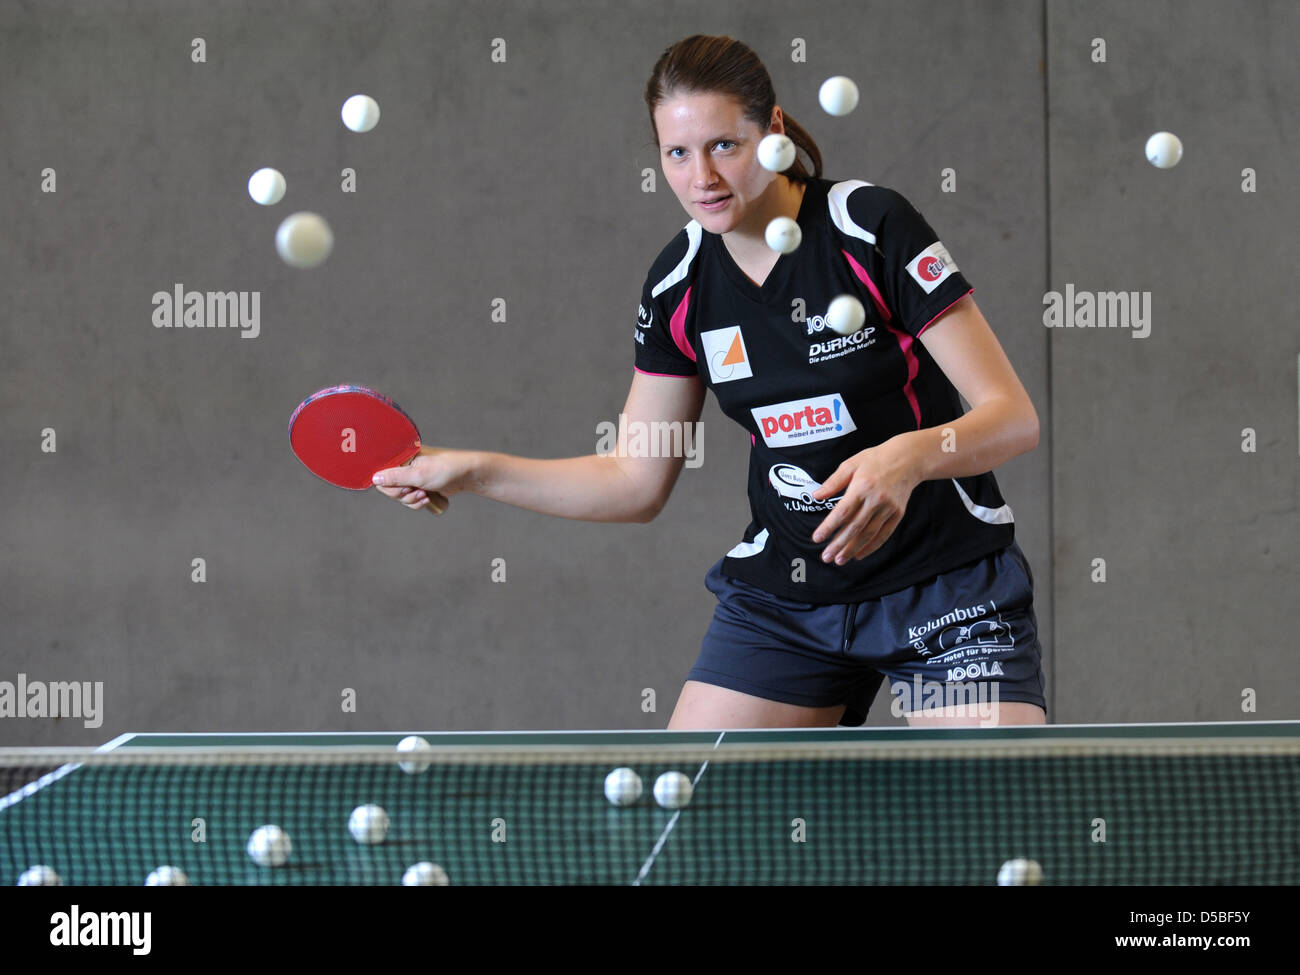 Berlino, Germania, ping-pong player Irene Ivancan Immagini Stock